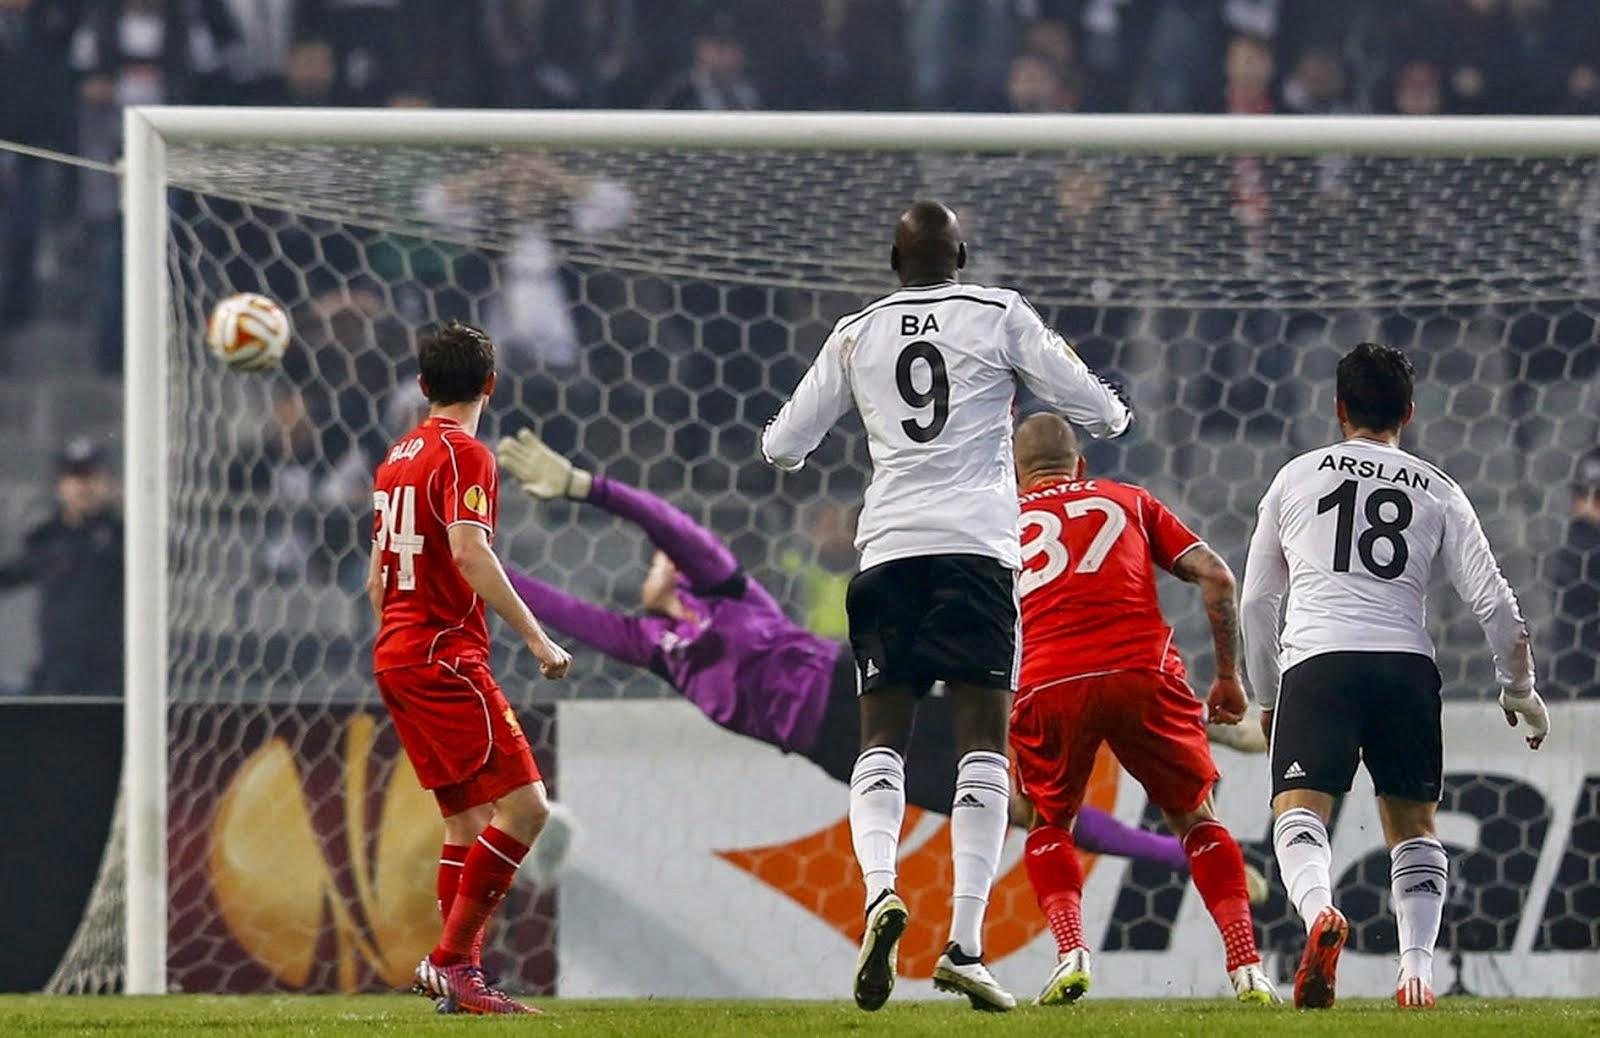 Tolgay Arslan scores a perfect goal against Liverpool.